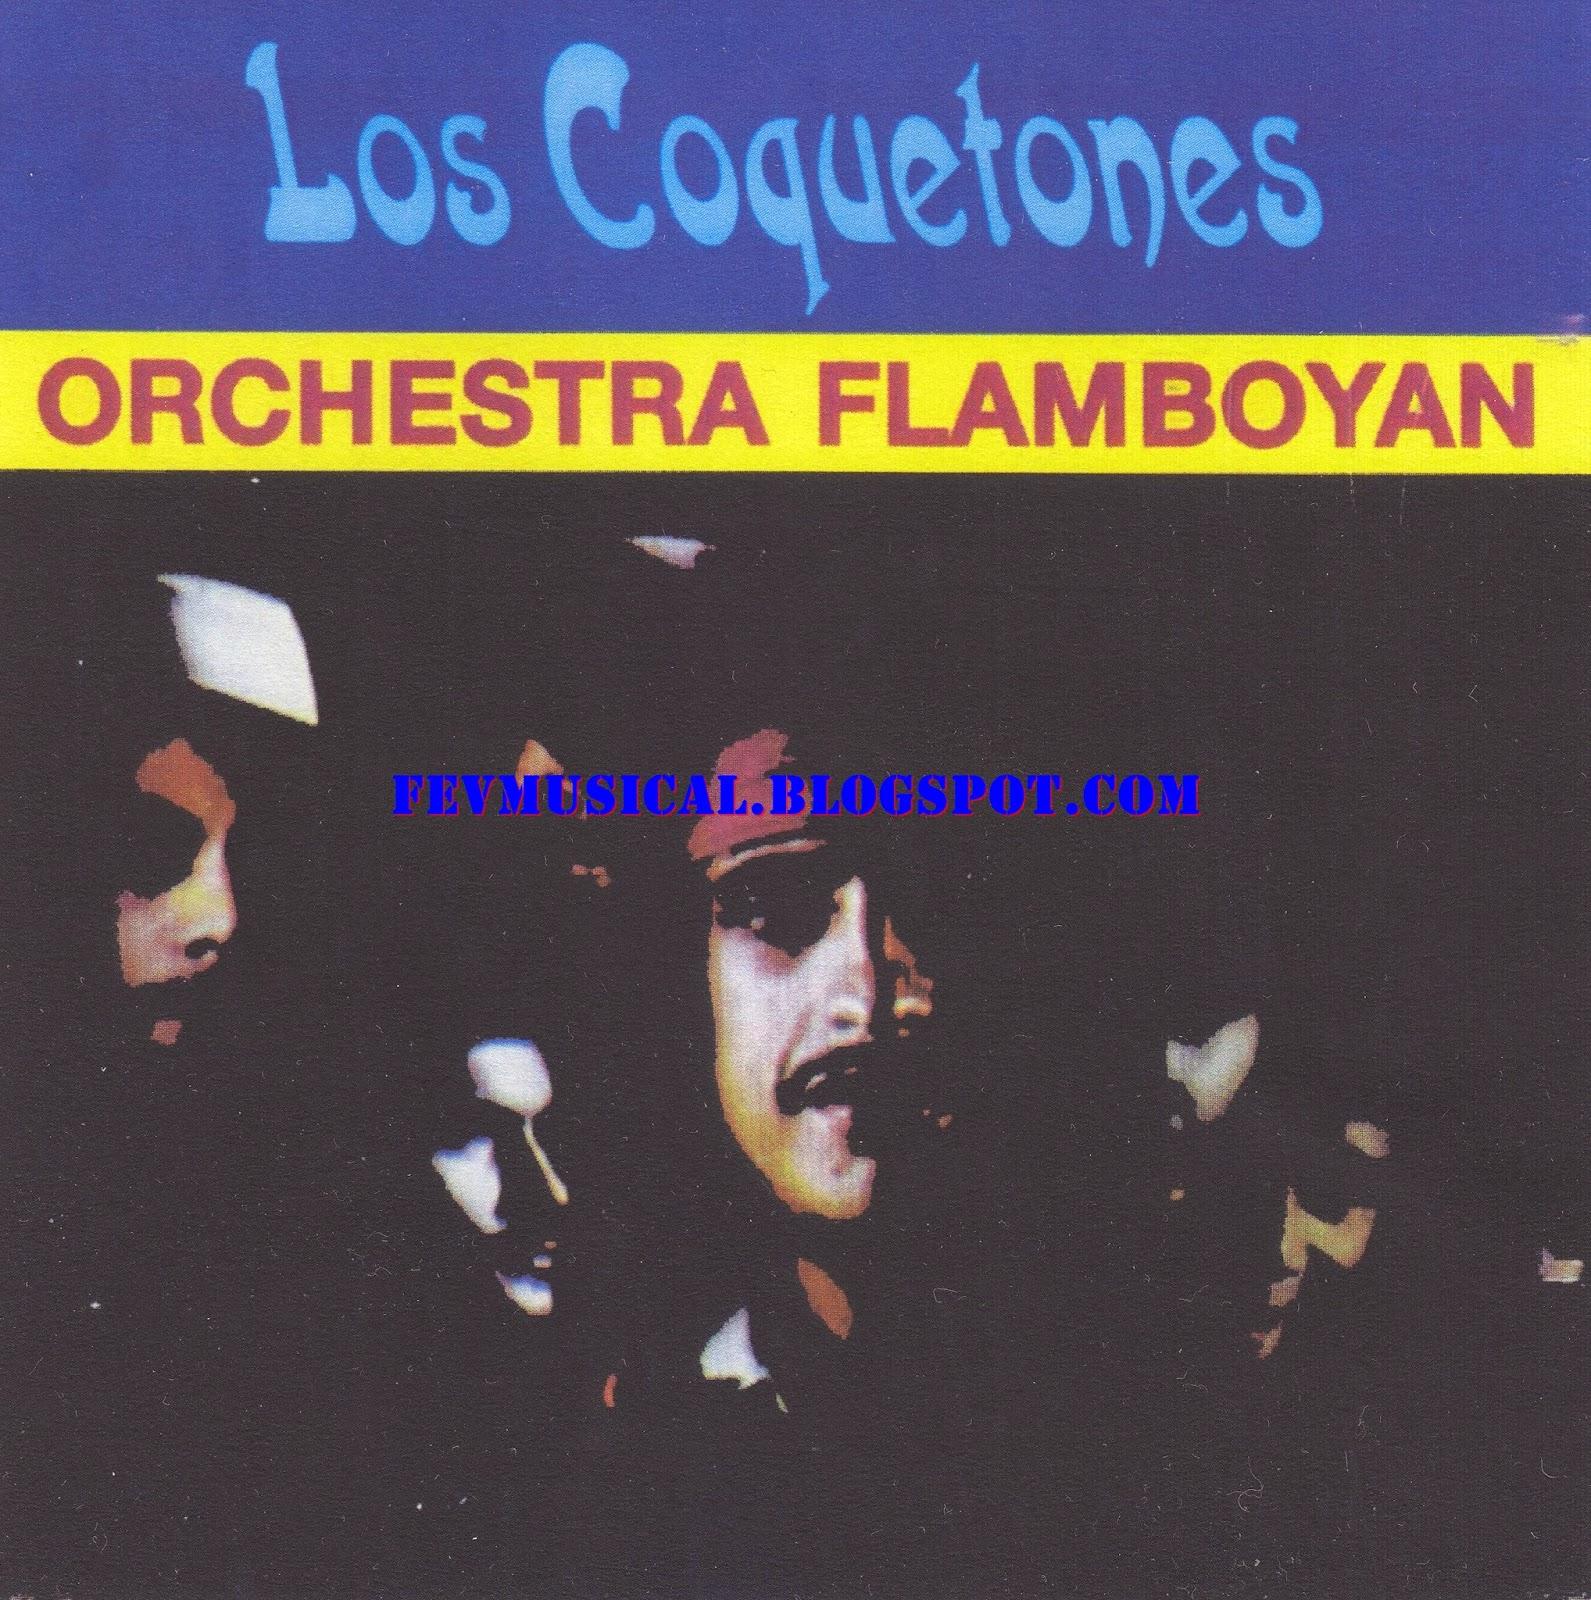 Frankie Dante Orquesta Flamboyan Con Larry Harlow Frankie Dante Orquesta Flamboyan Con Larry Harlow